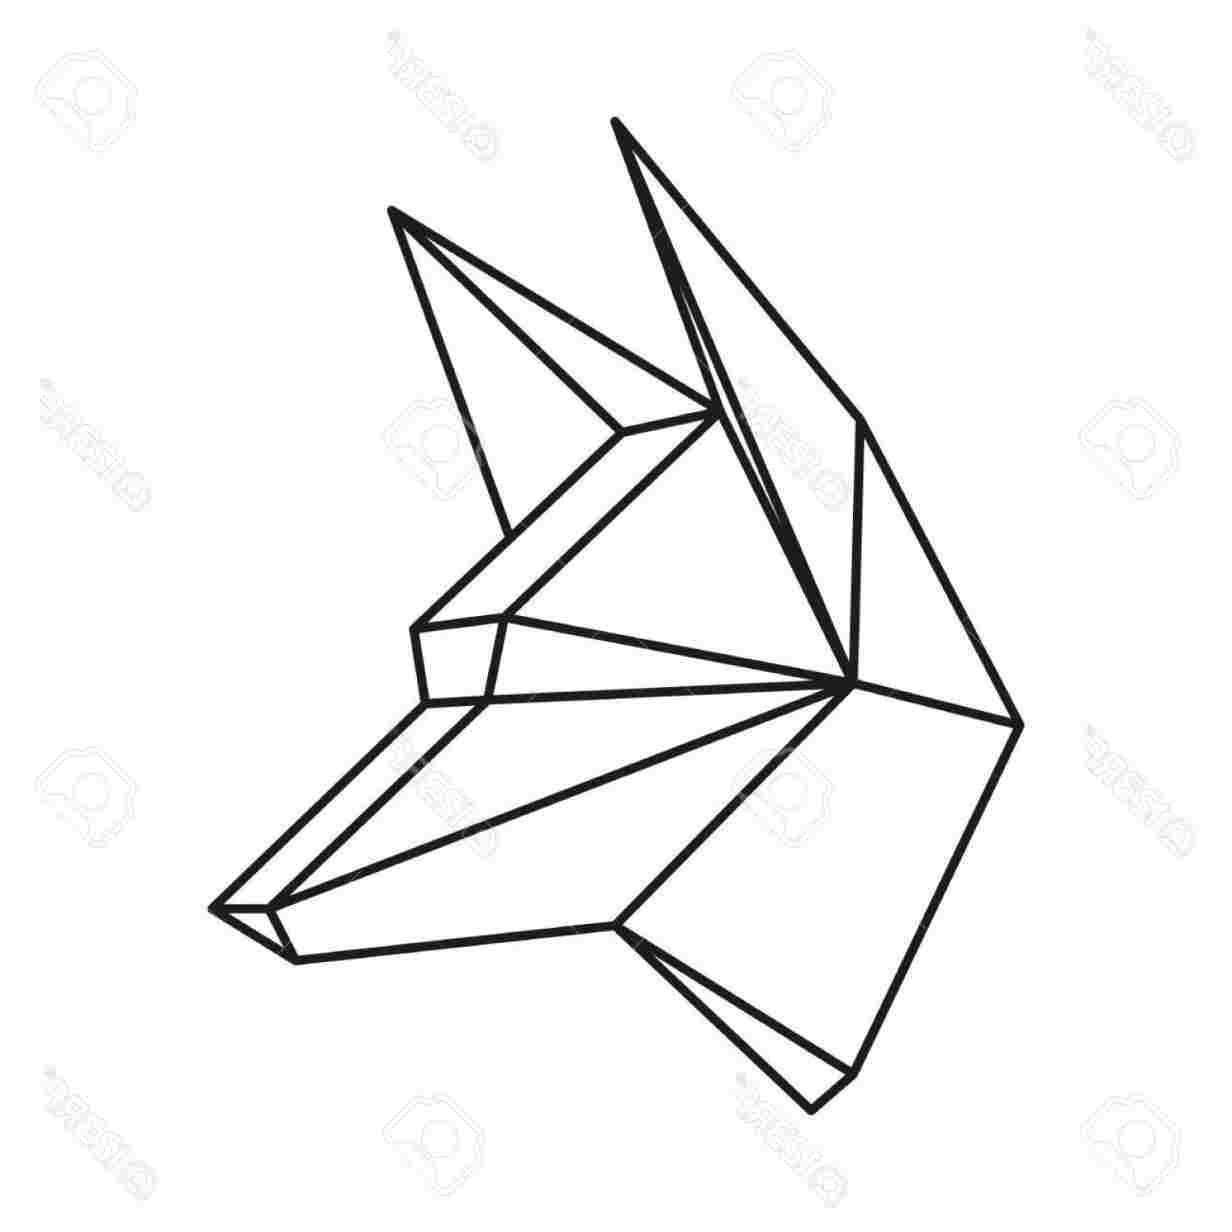 Animals Drawing Using Shapes